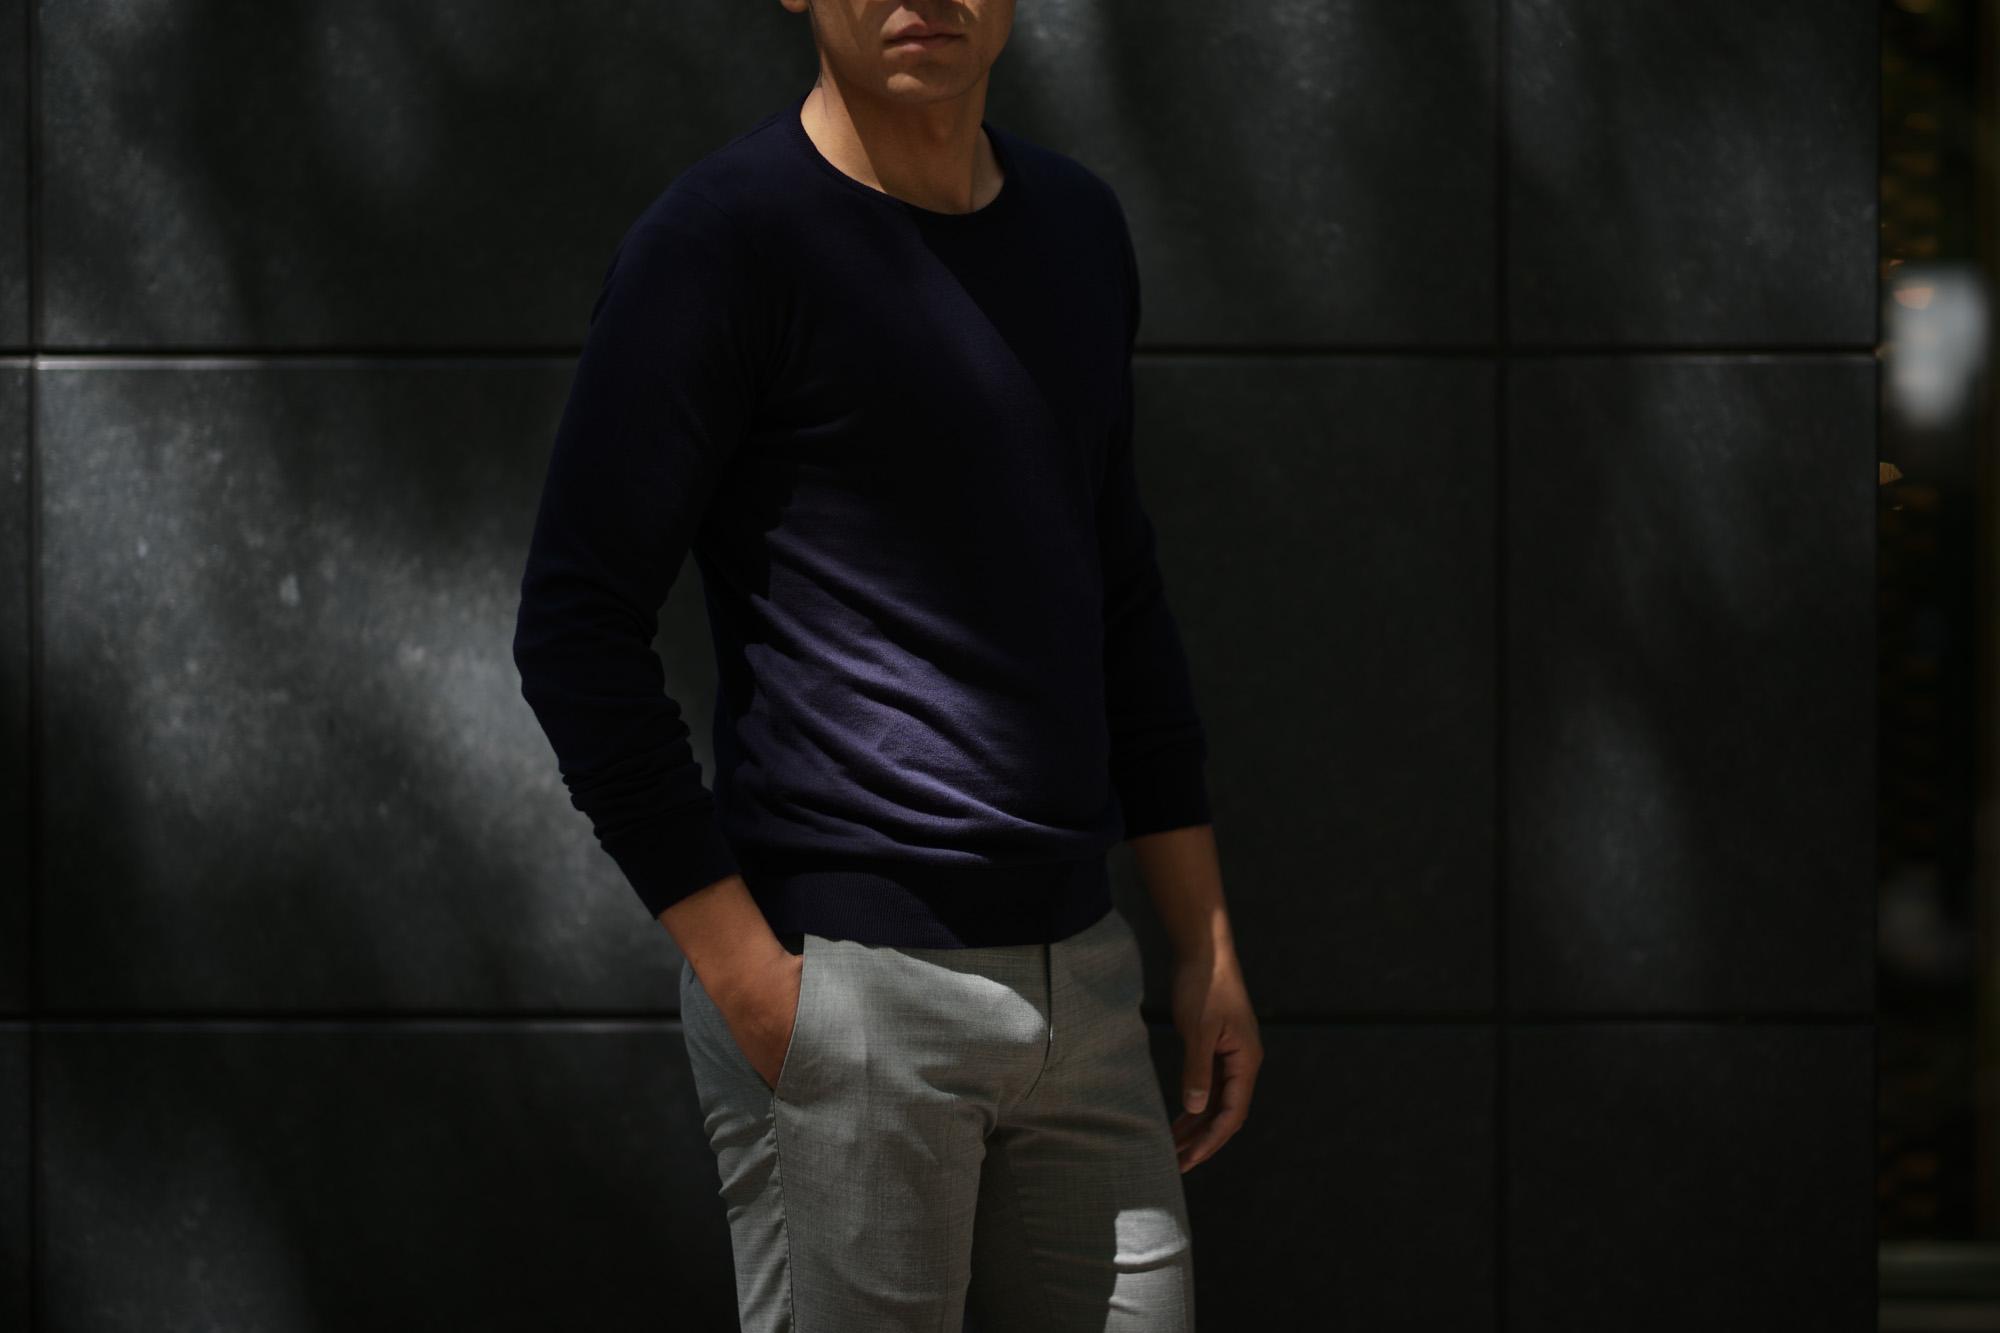 JOHN SMEDLEY (ジョンスメドレー) IMPERIAL KASHMIR (カシミアシリーズ) THEON (テオン) CASHMERE × SEA ISLAND COTTON コットンカシミヤニット セーター NAVY (ネイビー)  Made in England (イギリス製) 2019 春夏新作 johnsmedley 愛知 名古屋 altoediritto アルトエデリット